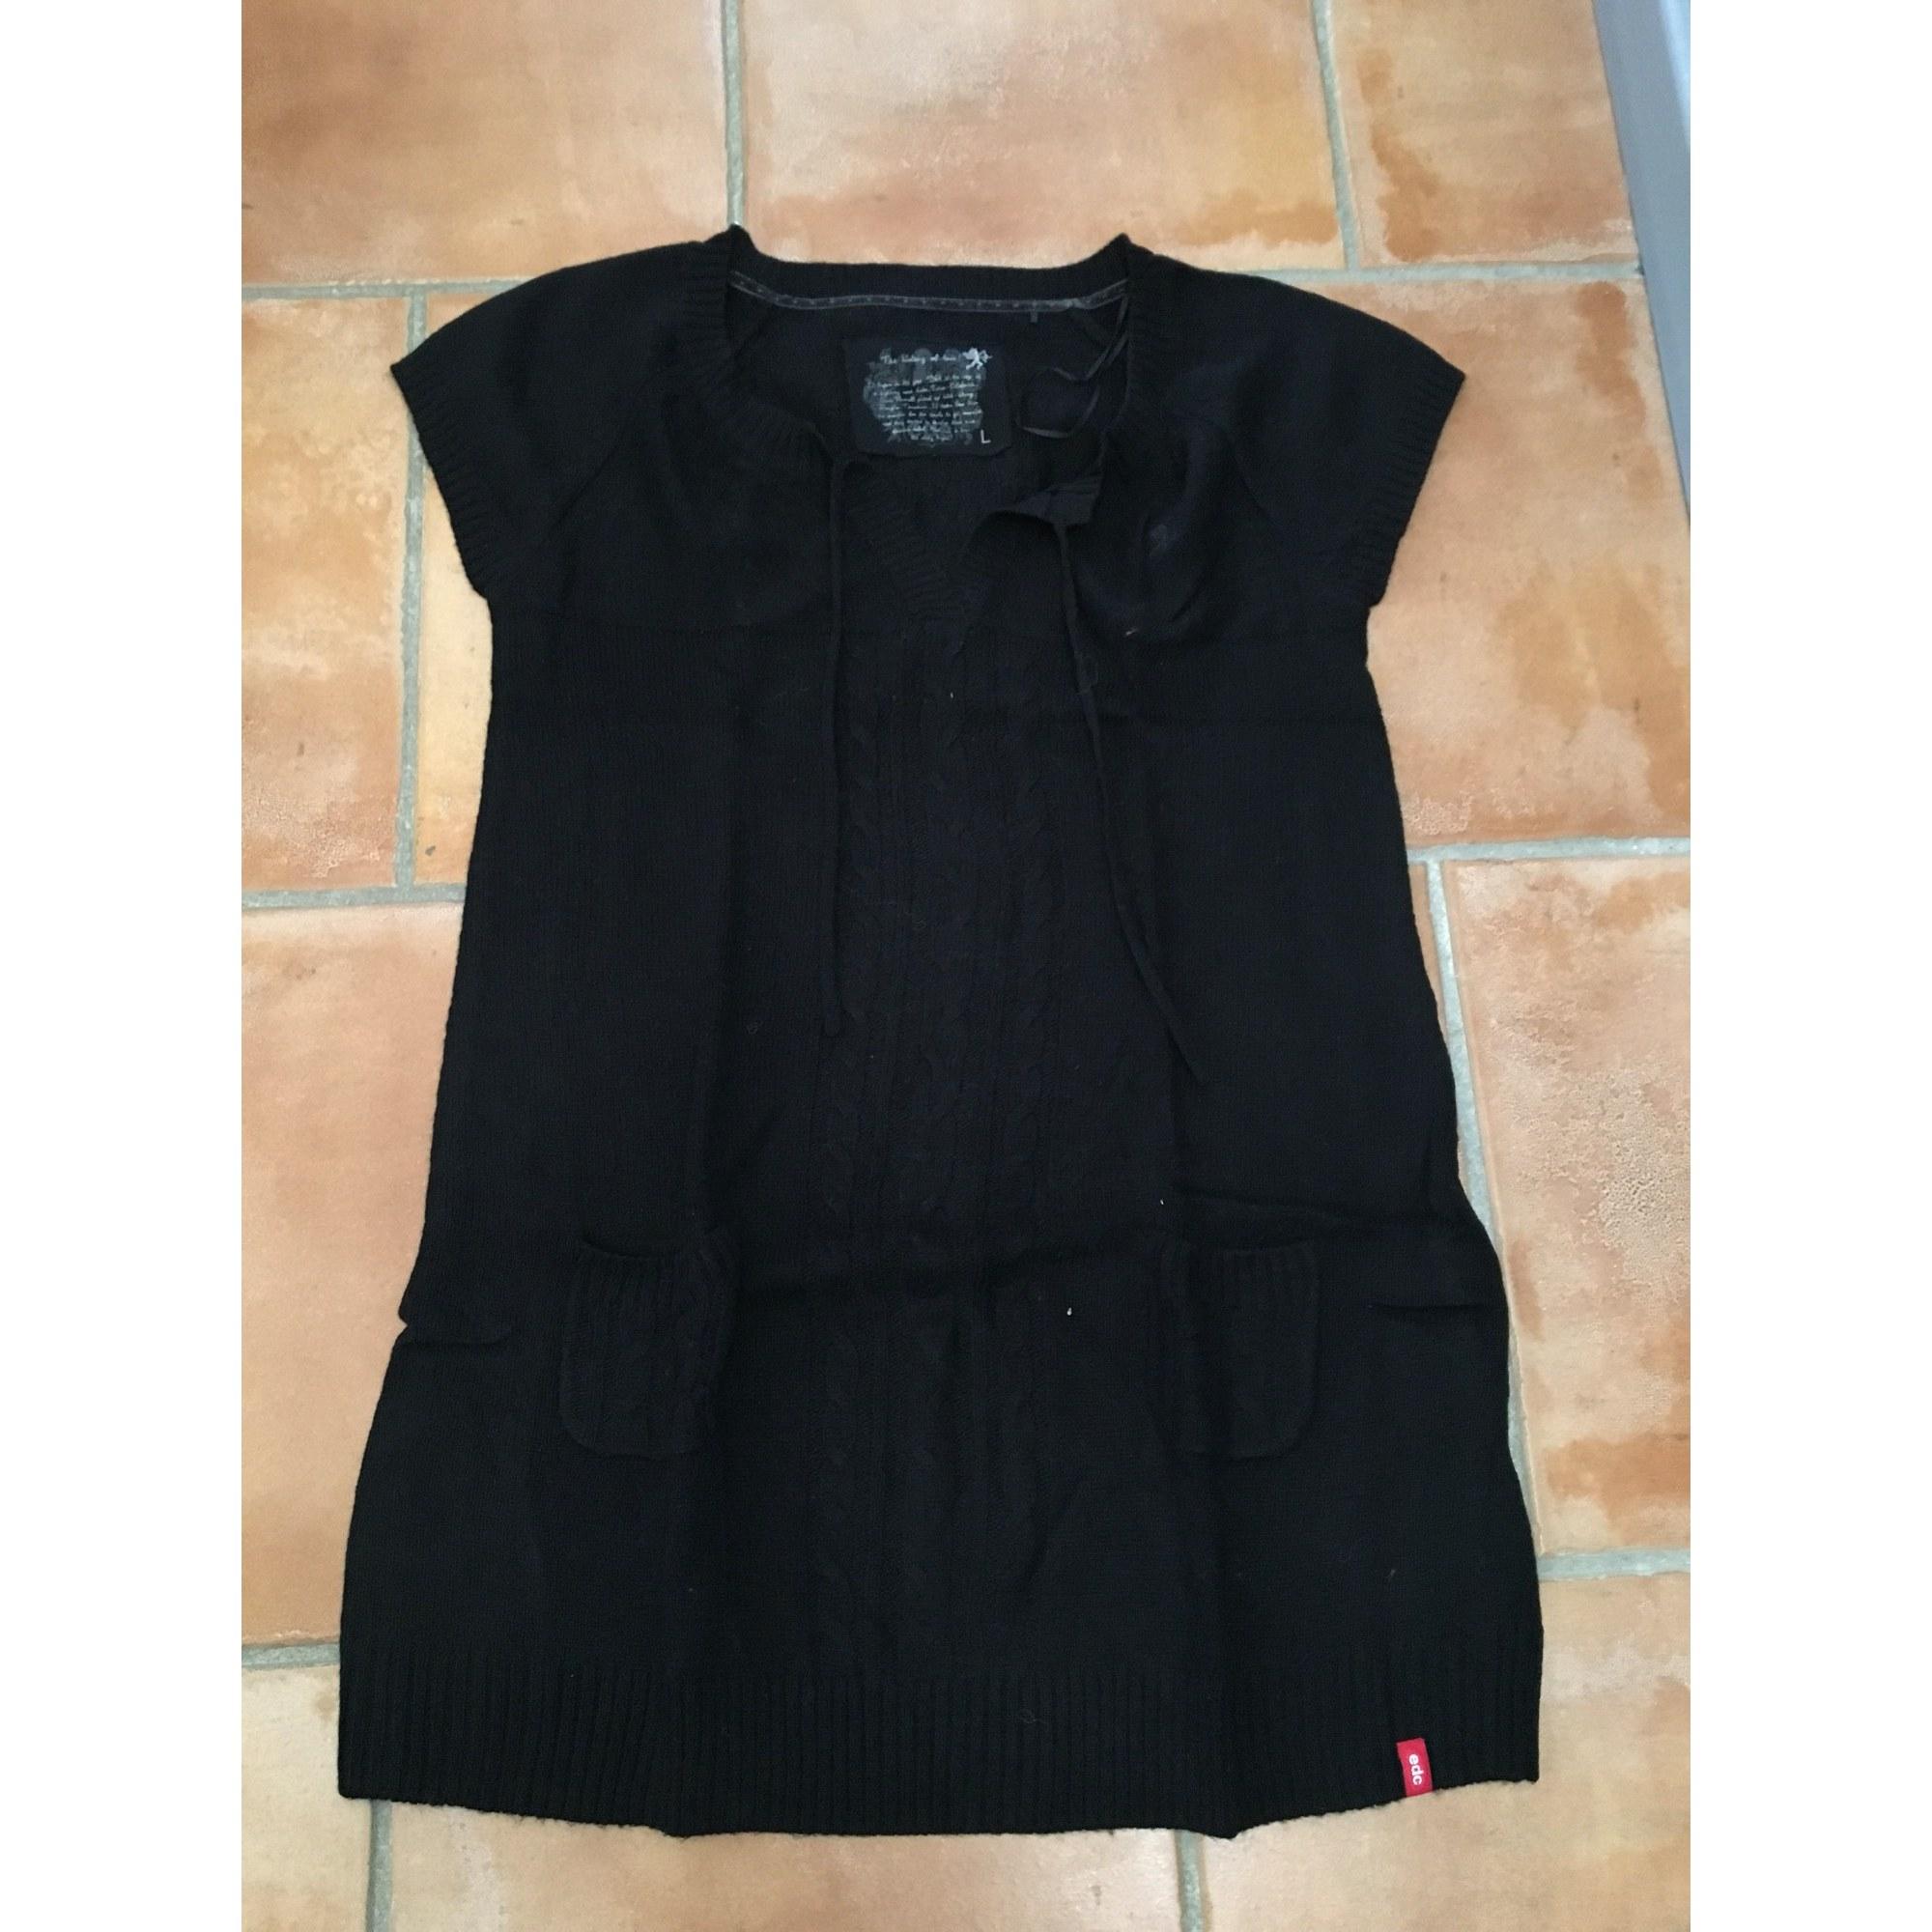 6480813 By Esprit Pull Robe Edc 42 Noir T4 lxl 8EpTx